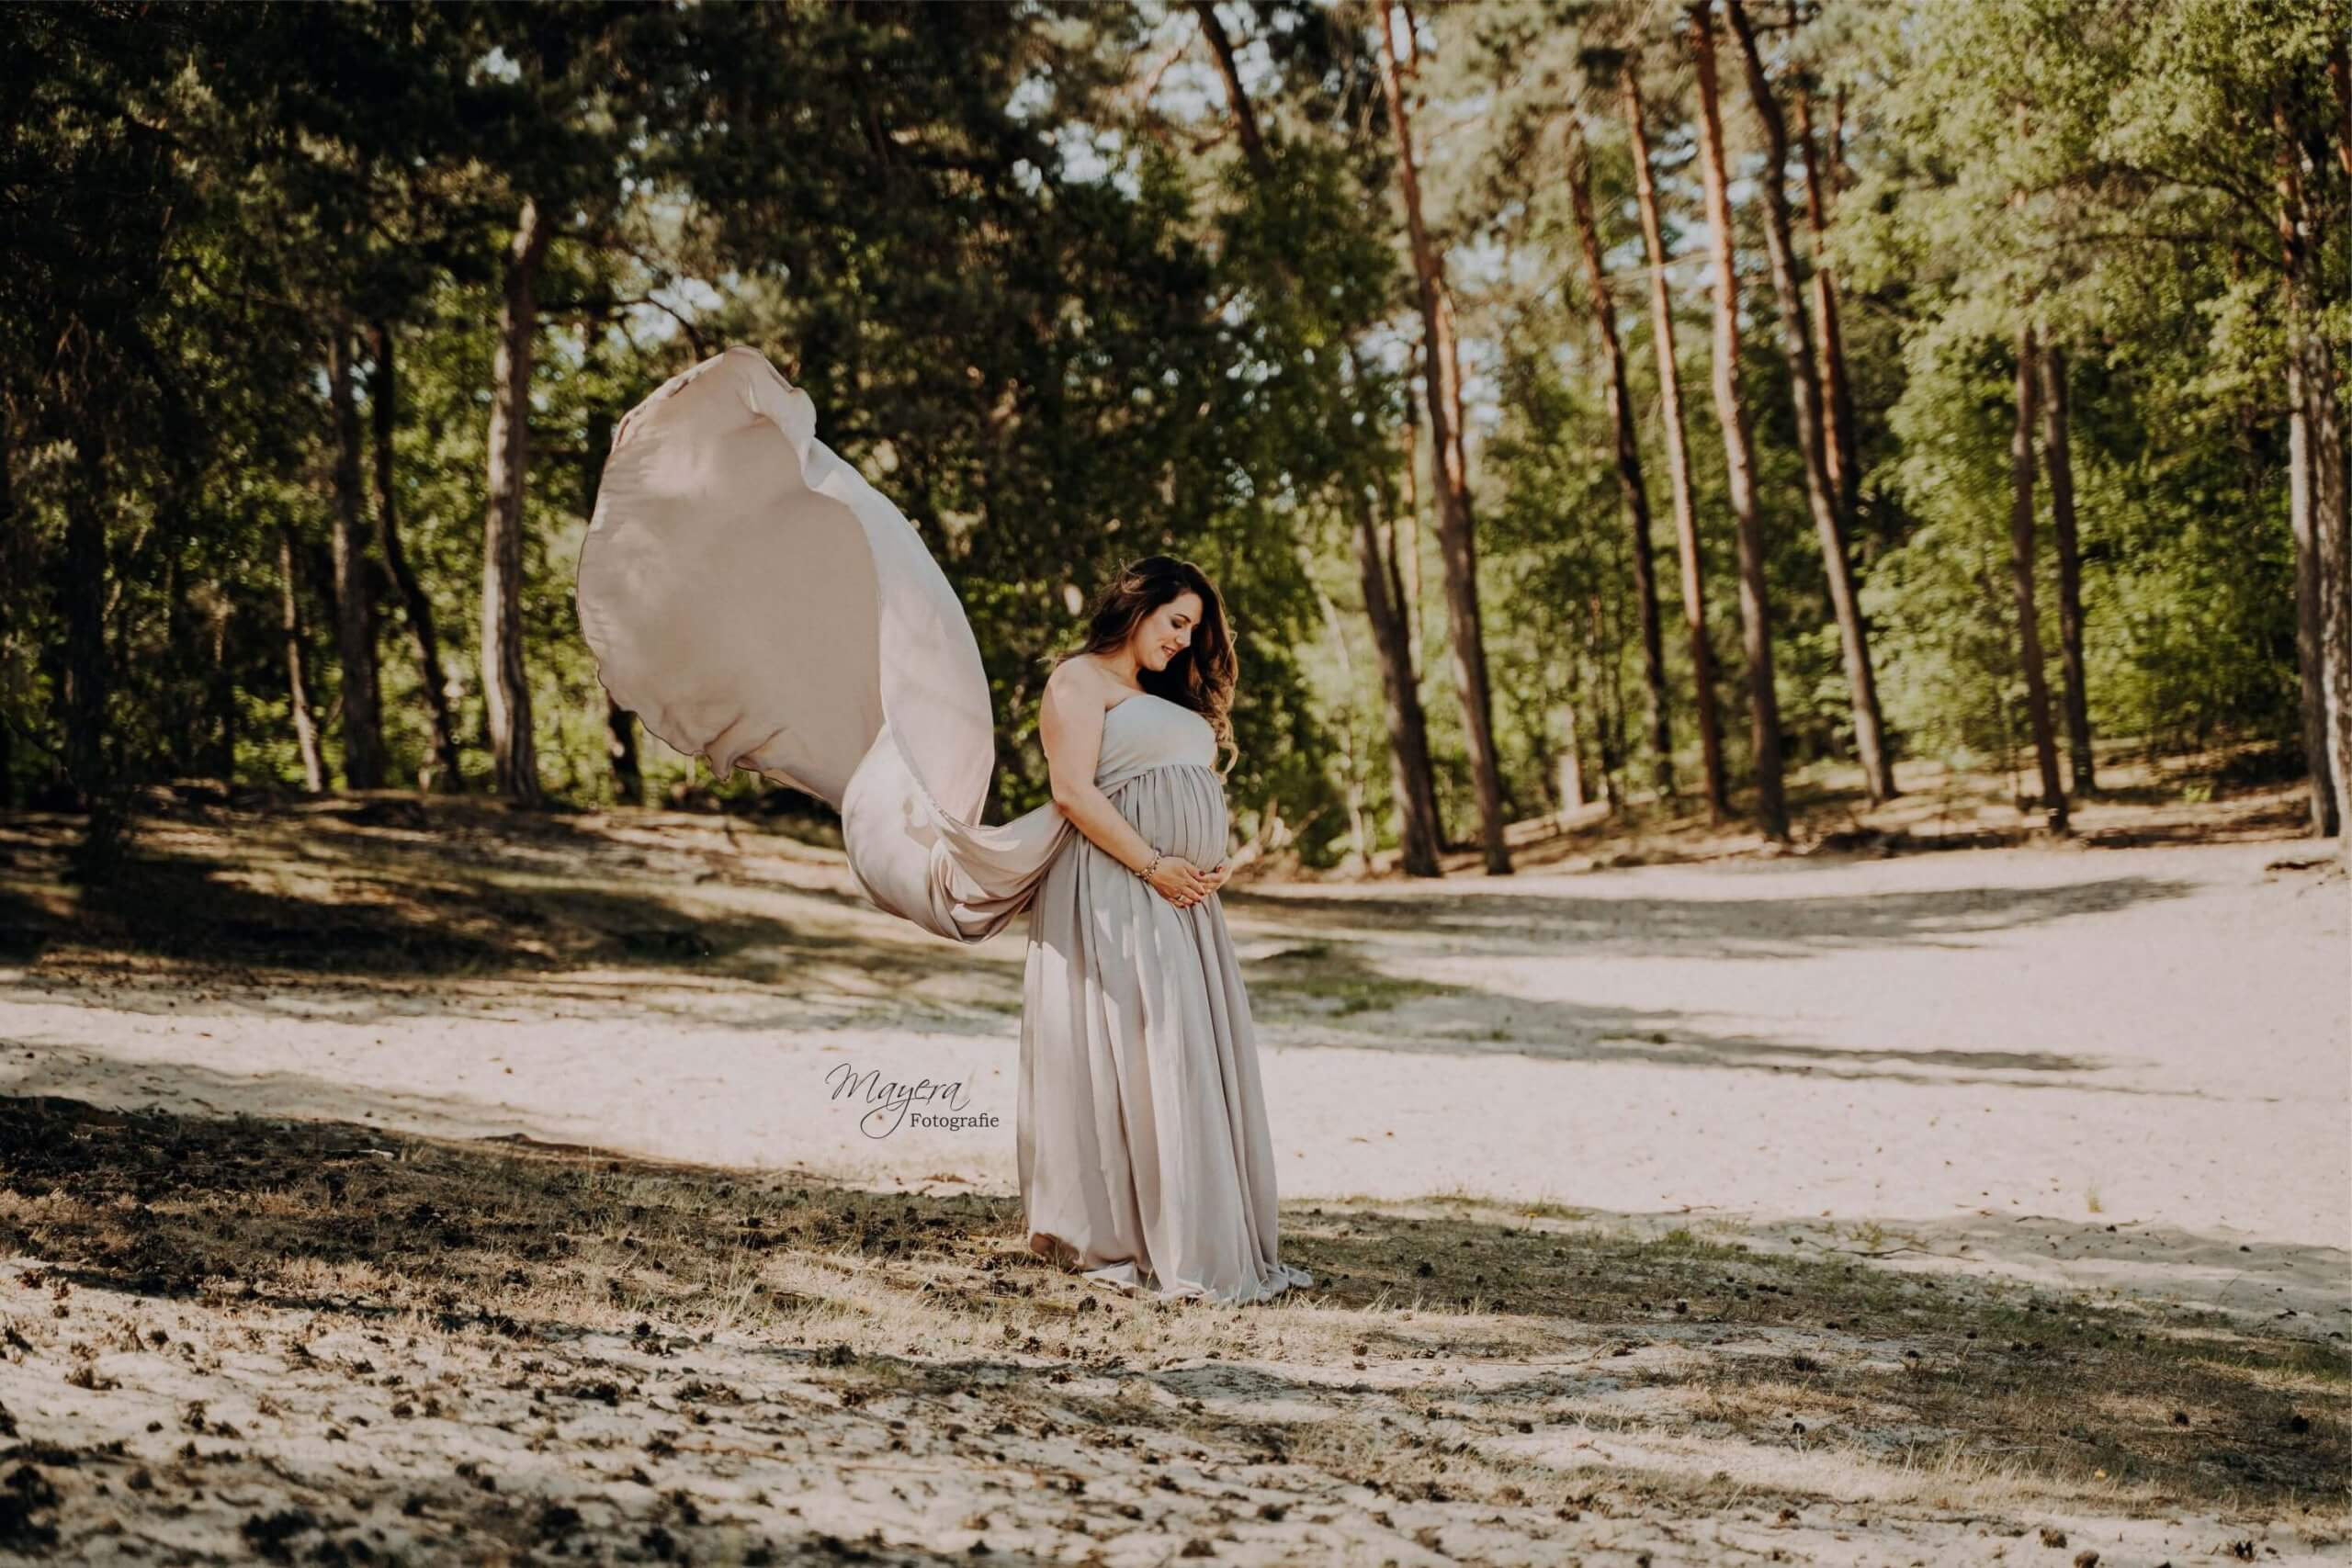 a Zwangerschap Grote bos doorn maternity jurk natuurlijk zandvlakte